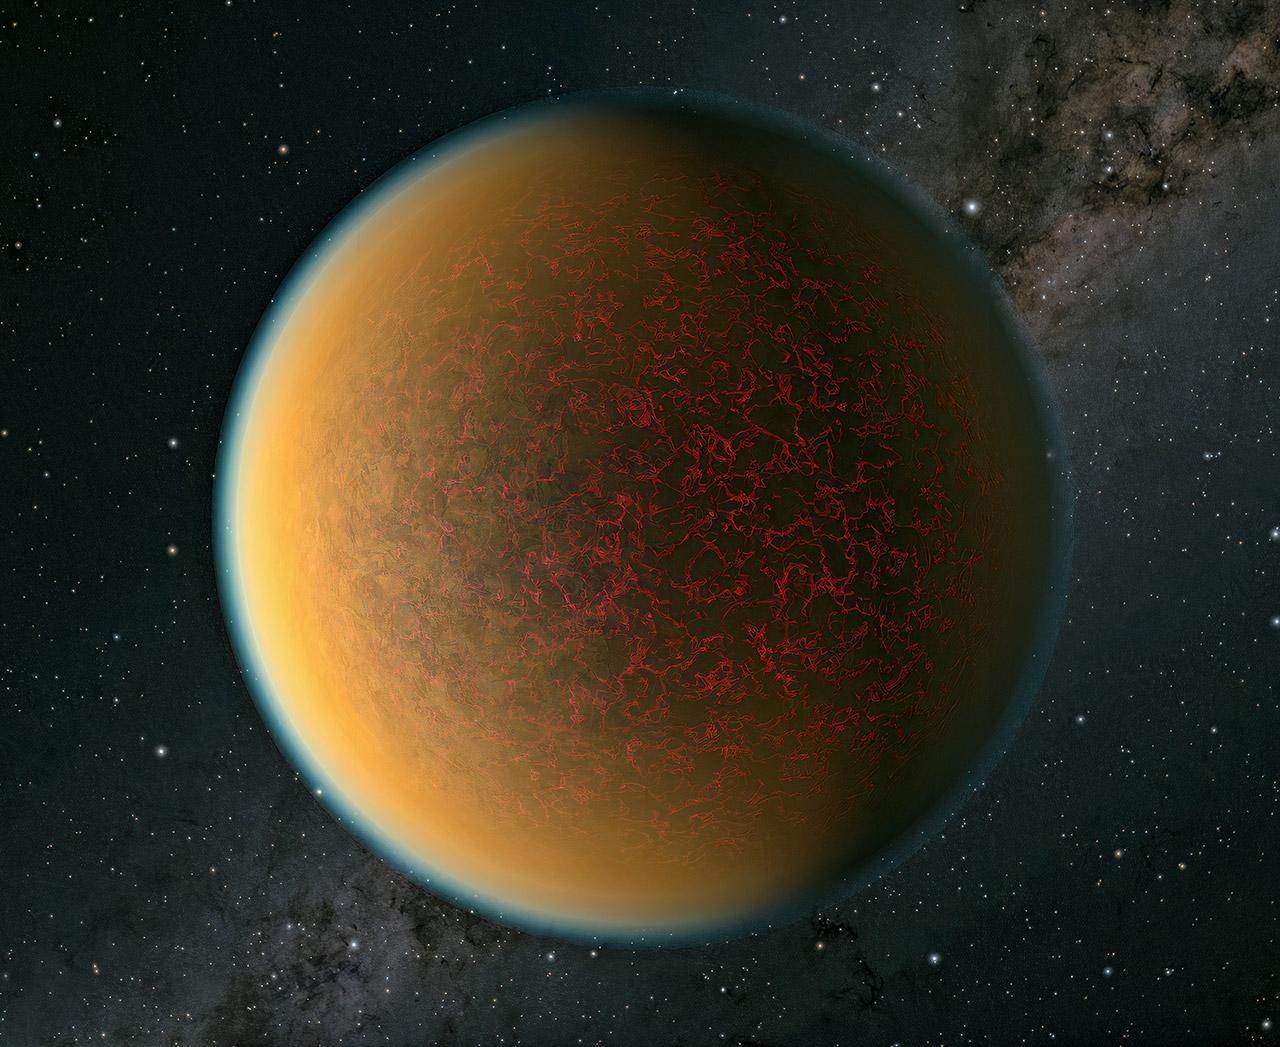 NASA Hubble GJ 1132 b Planet Second Atmosphere